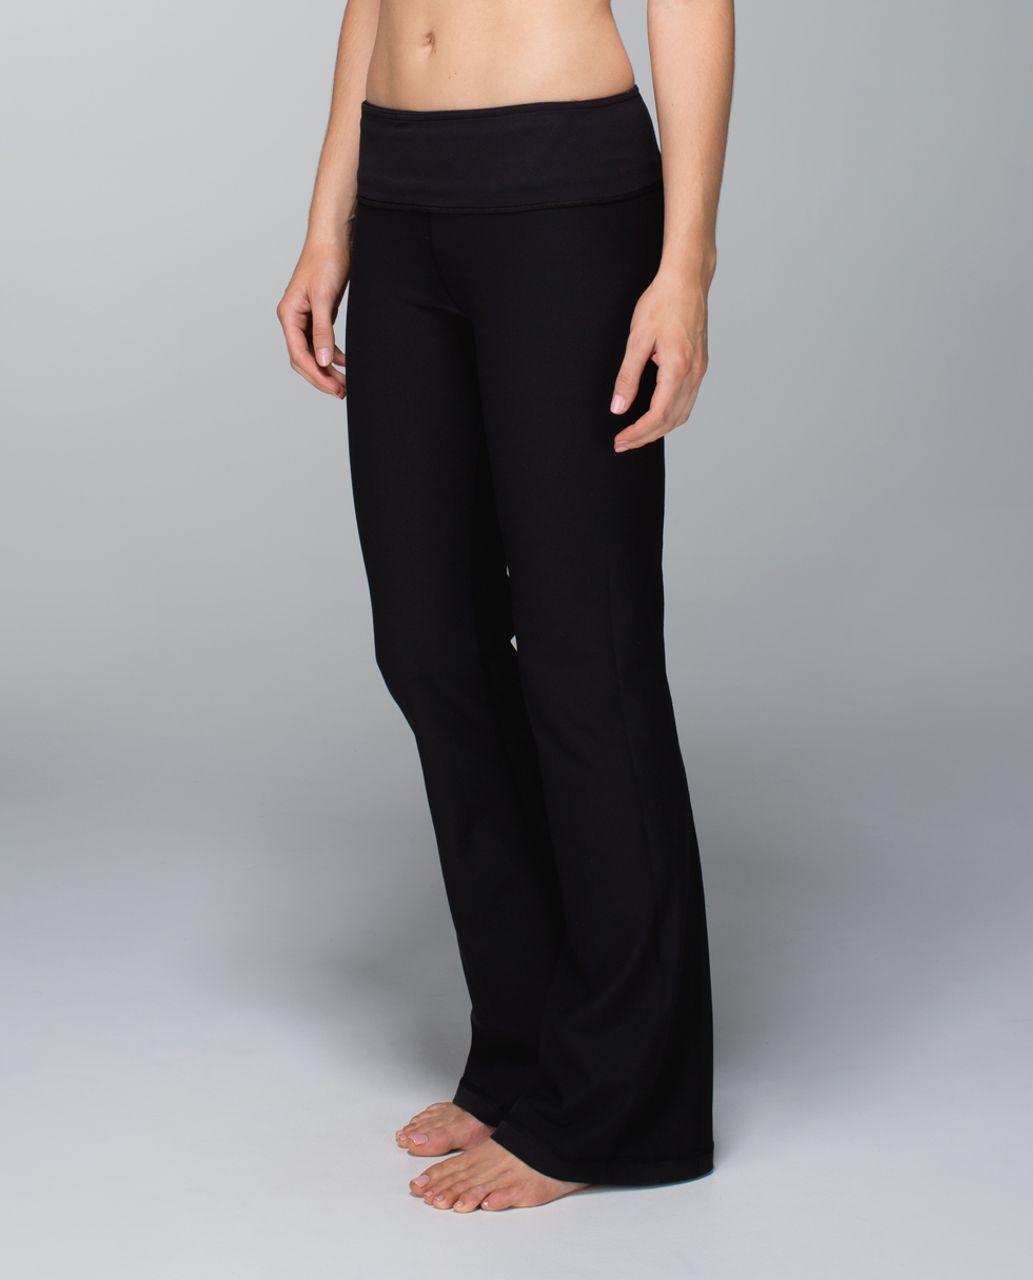 Lululemon Groove Pant (Tall) *Full-On Luon - Black / Quilt Winter 13-12